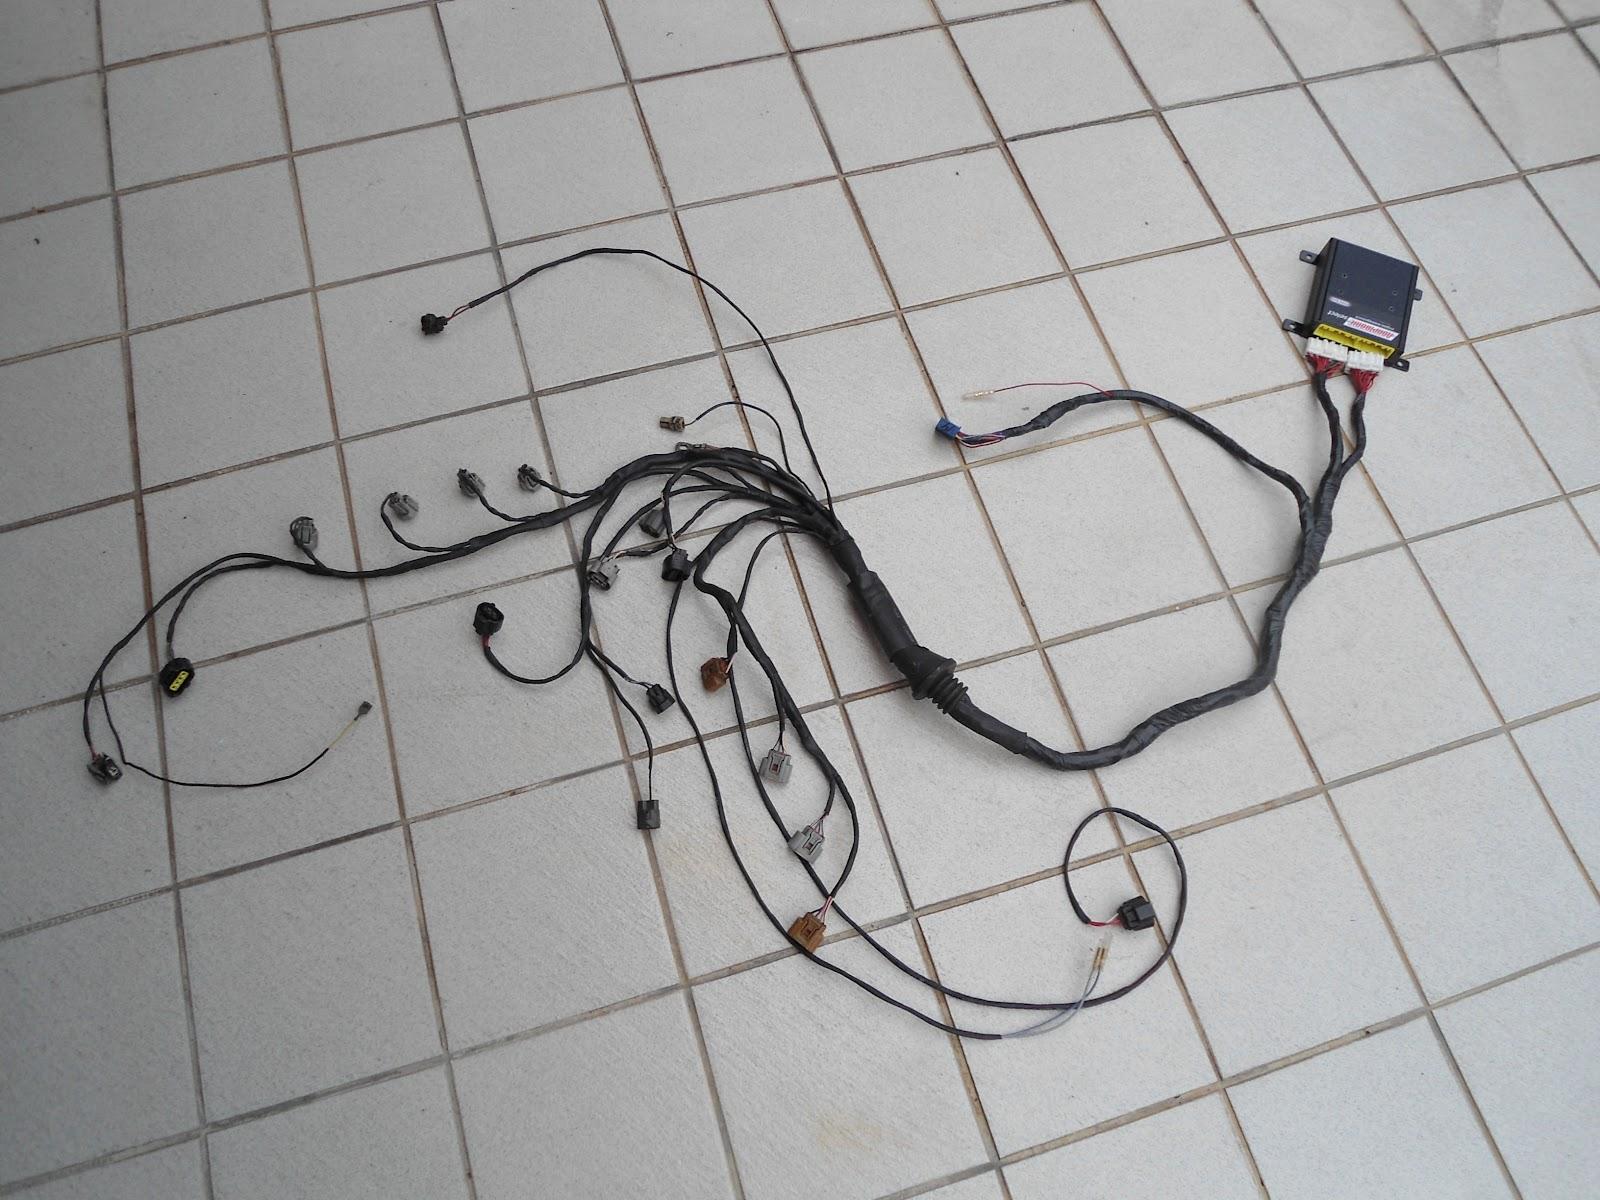 Idle Air Control Valve Location In Addition Rb25det Ecu Pinout Diagram